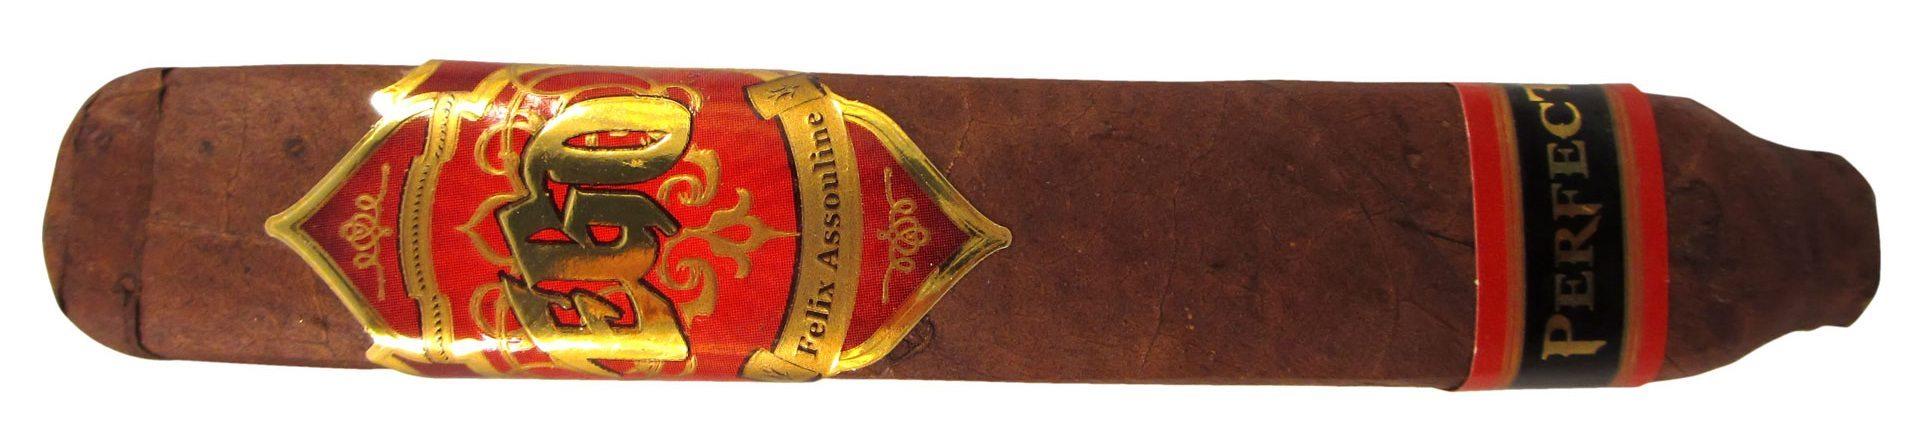 Blind Cigar Review: Felix Assouline | EGO Perfect